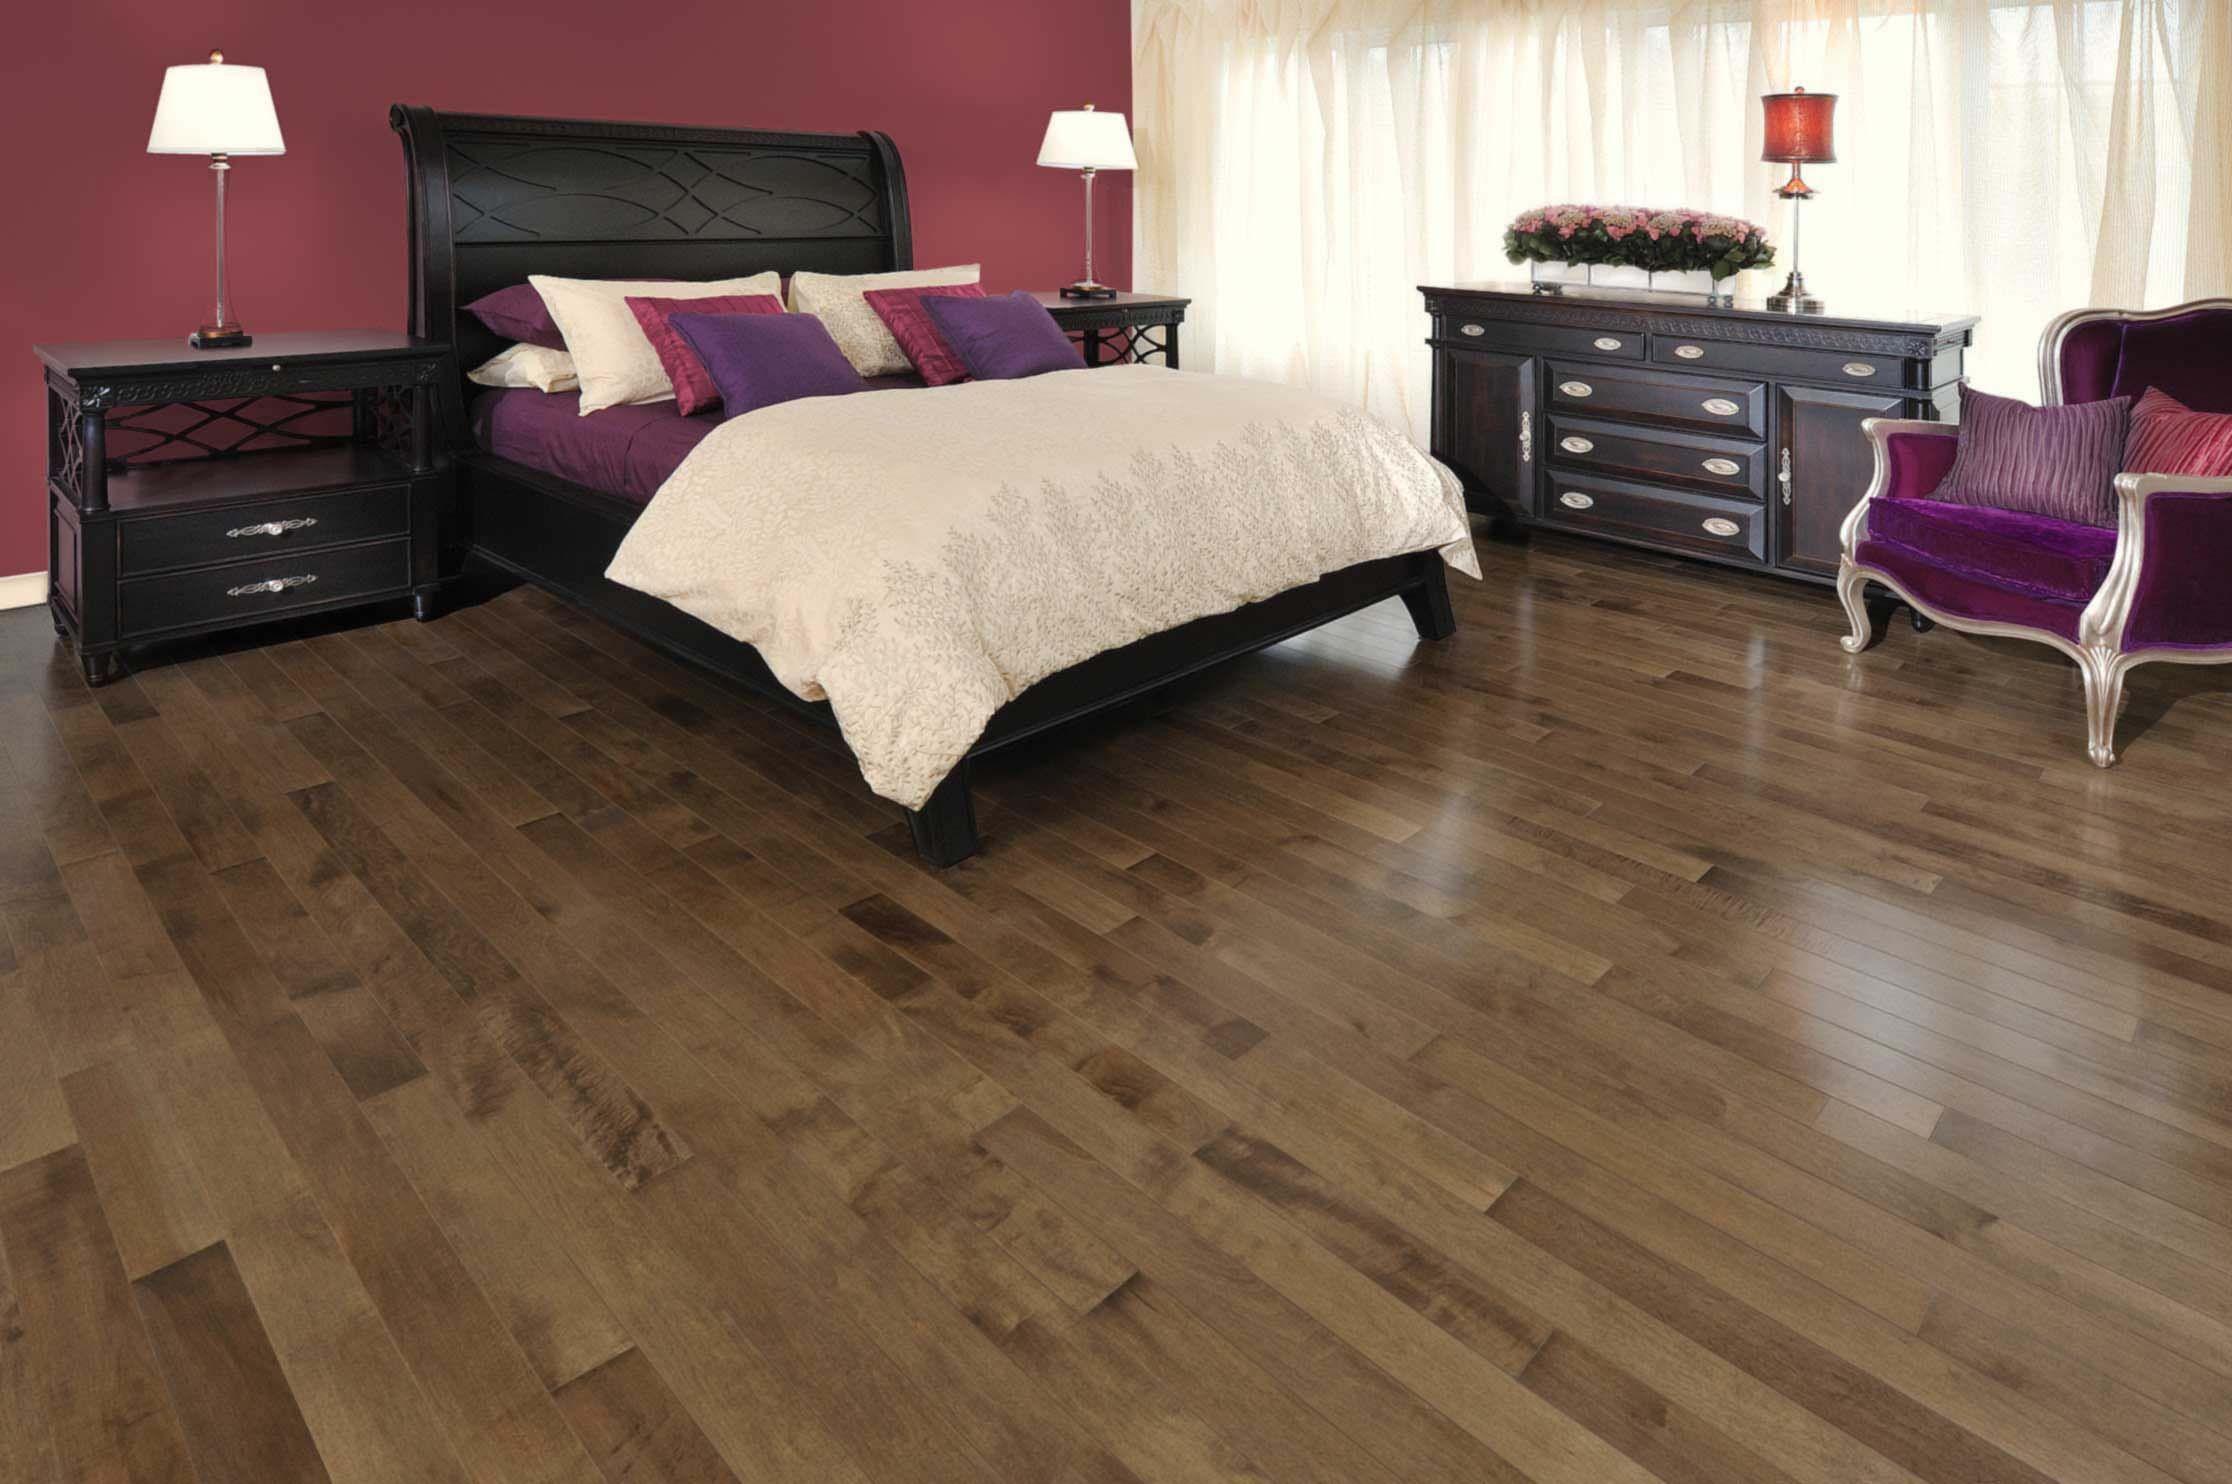 Maple Savanna - Inspiration Collection by Mirage Floors